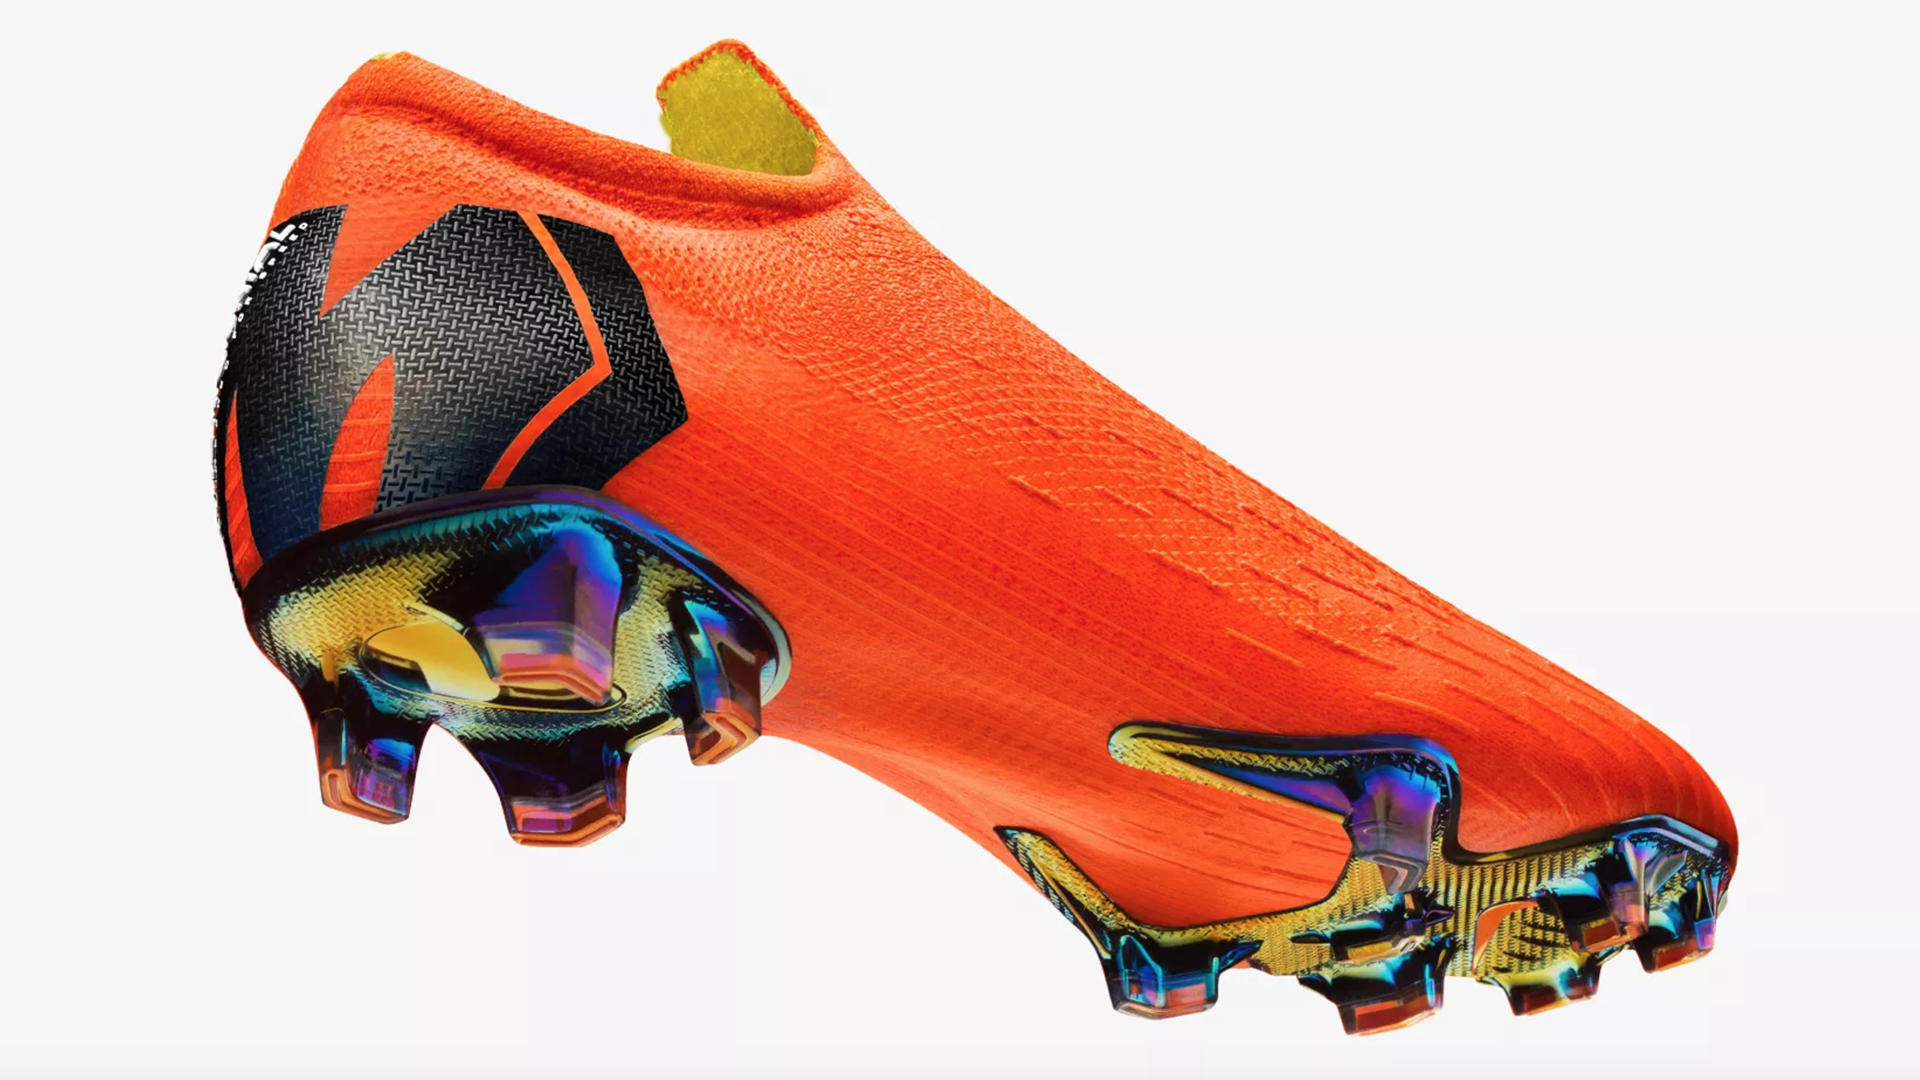 mercurial soccer boots 2018